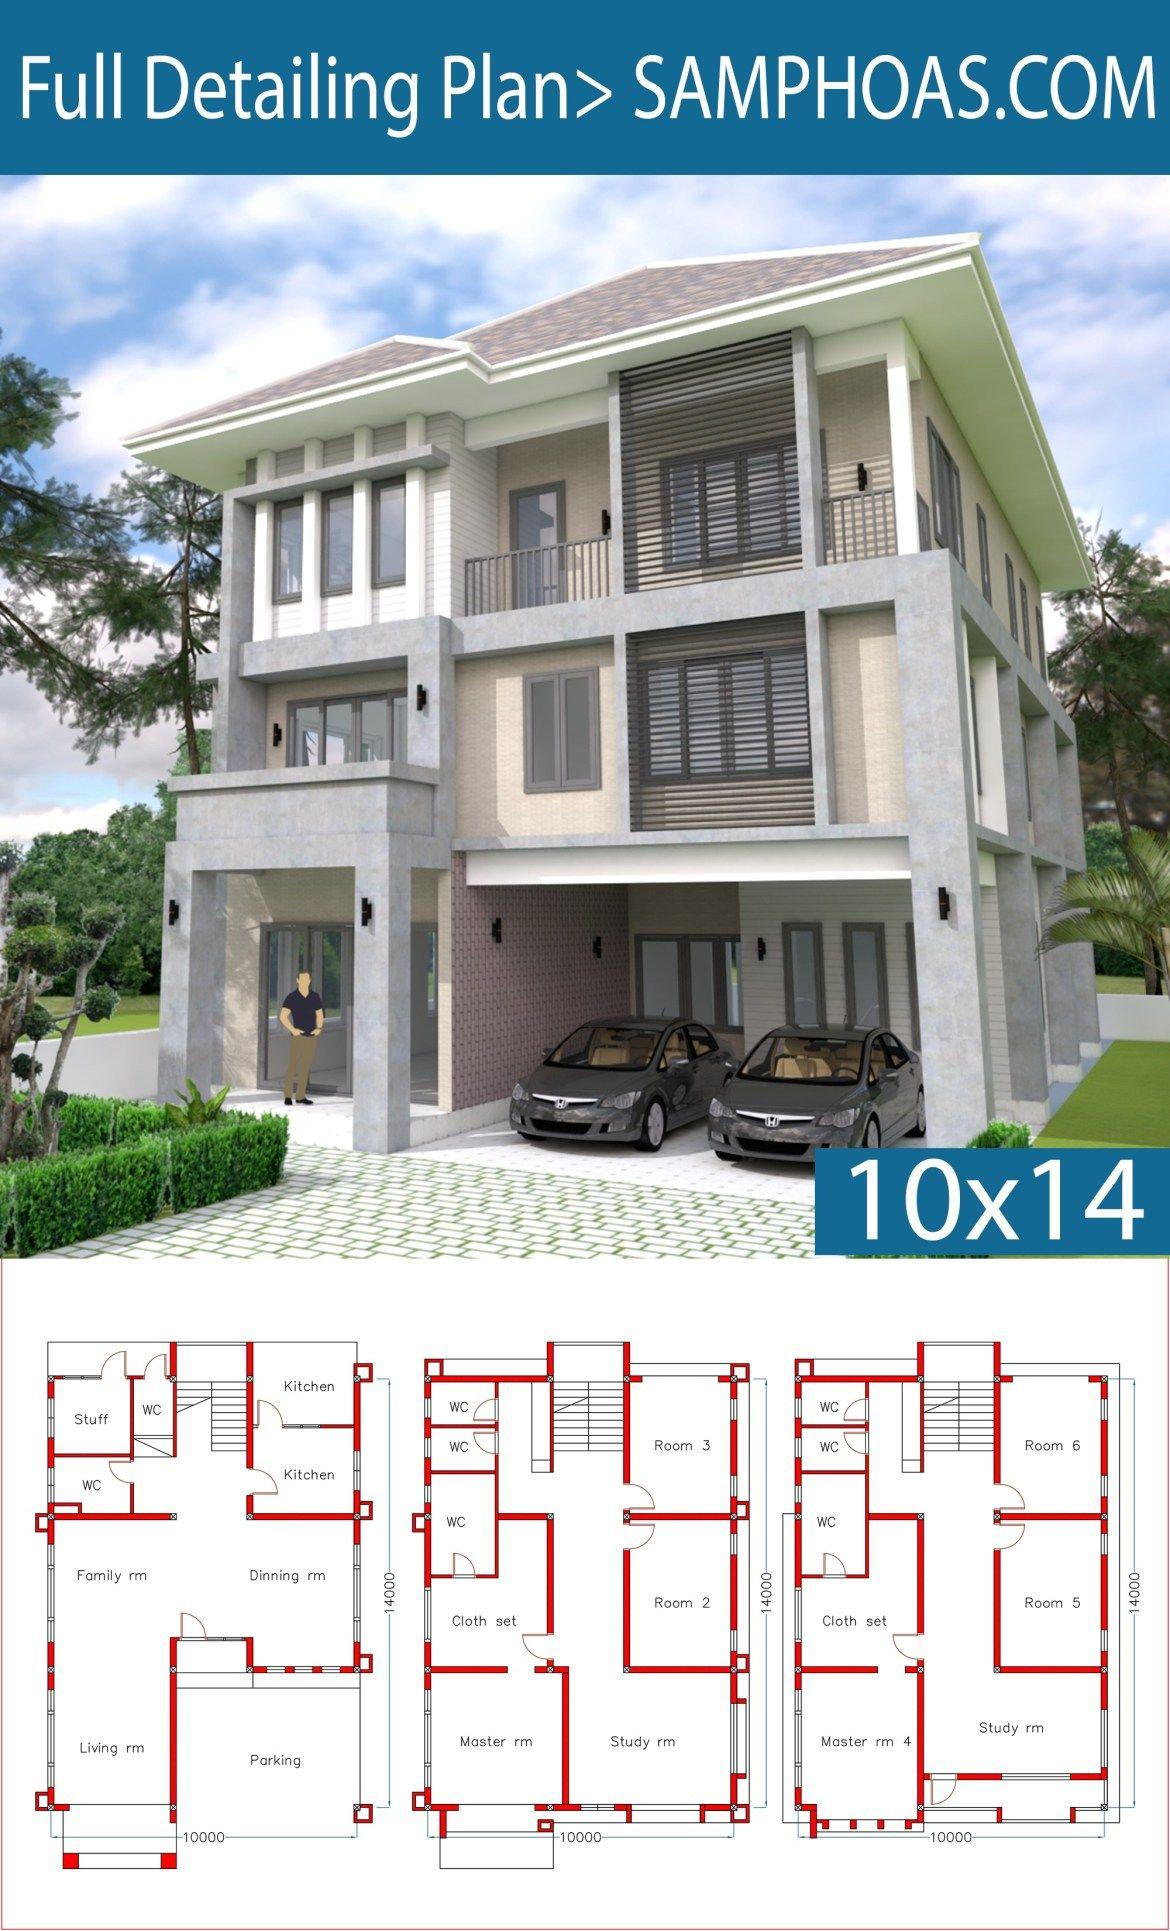 Modern 6 Bedrooms Home Plan 10x14m Samphoas Plansearch 6 Bedroom House Plans Modern House Plans My House Plans